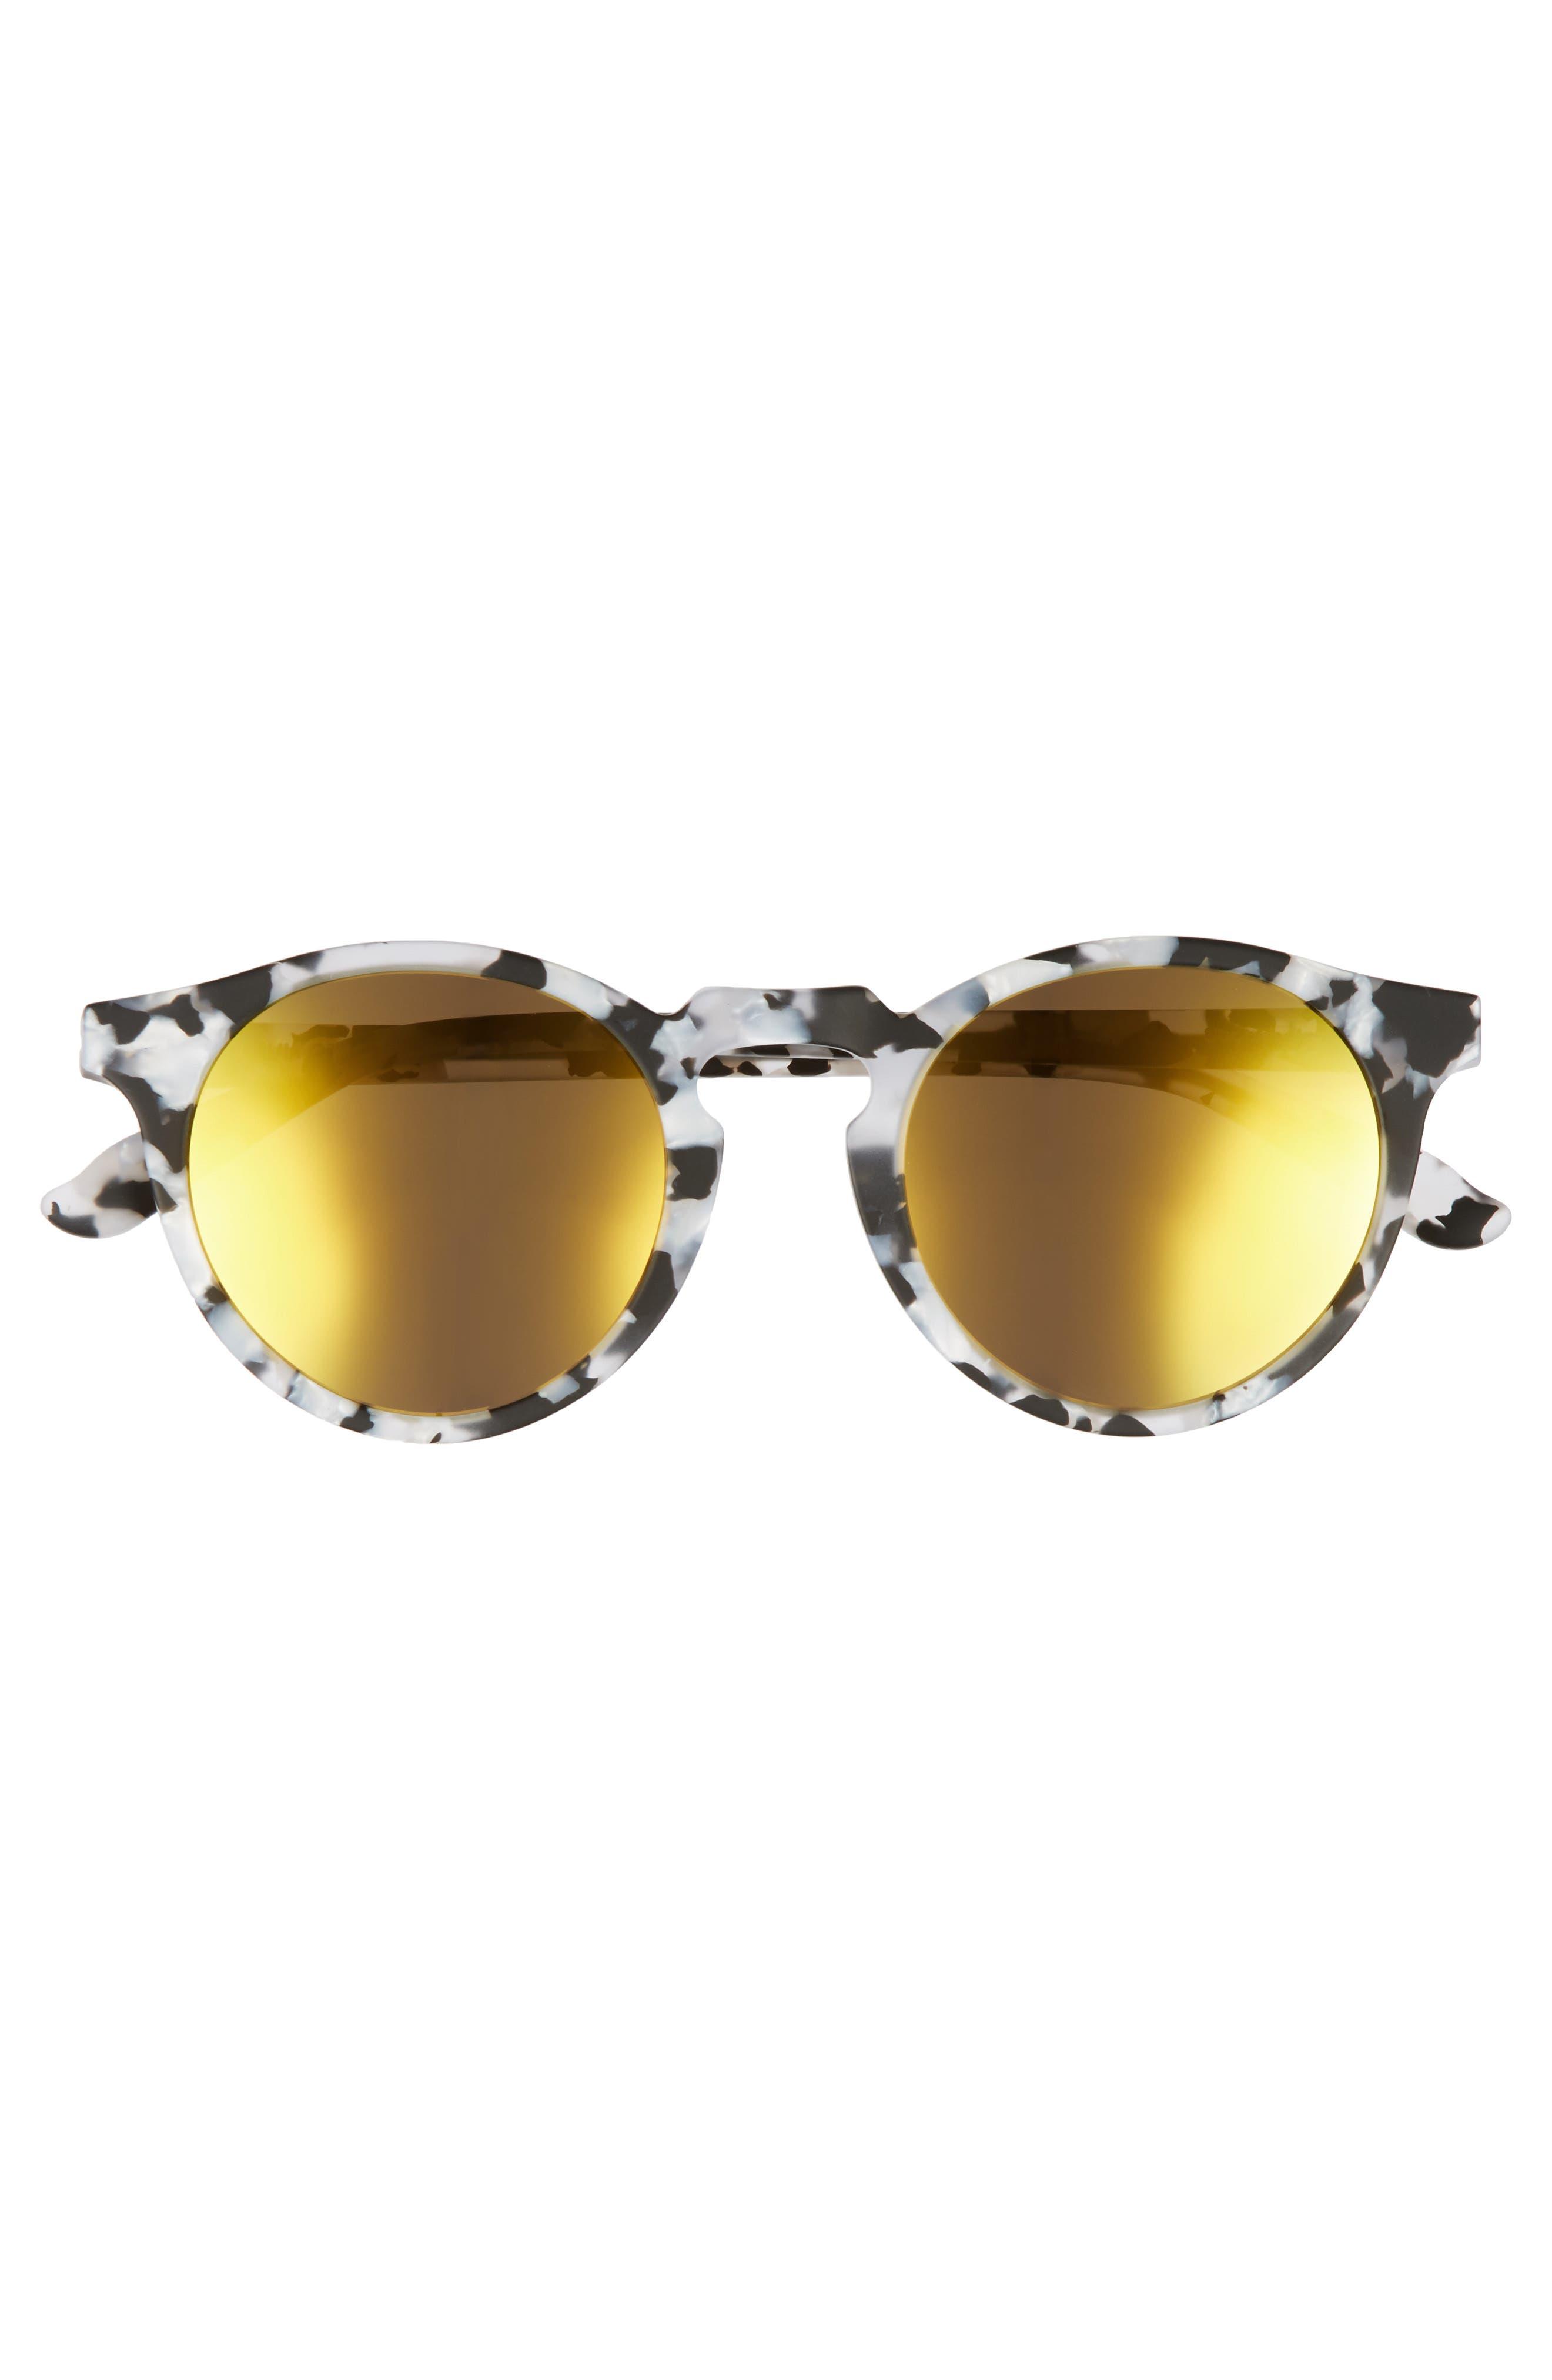 Stockholm 48mm Polarized Round Sunglasses,                             Alternate thumbnail 3, color,                             001